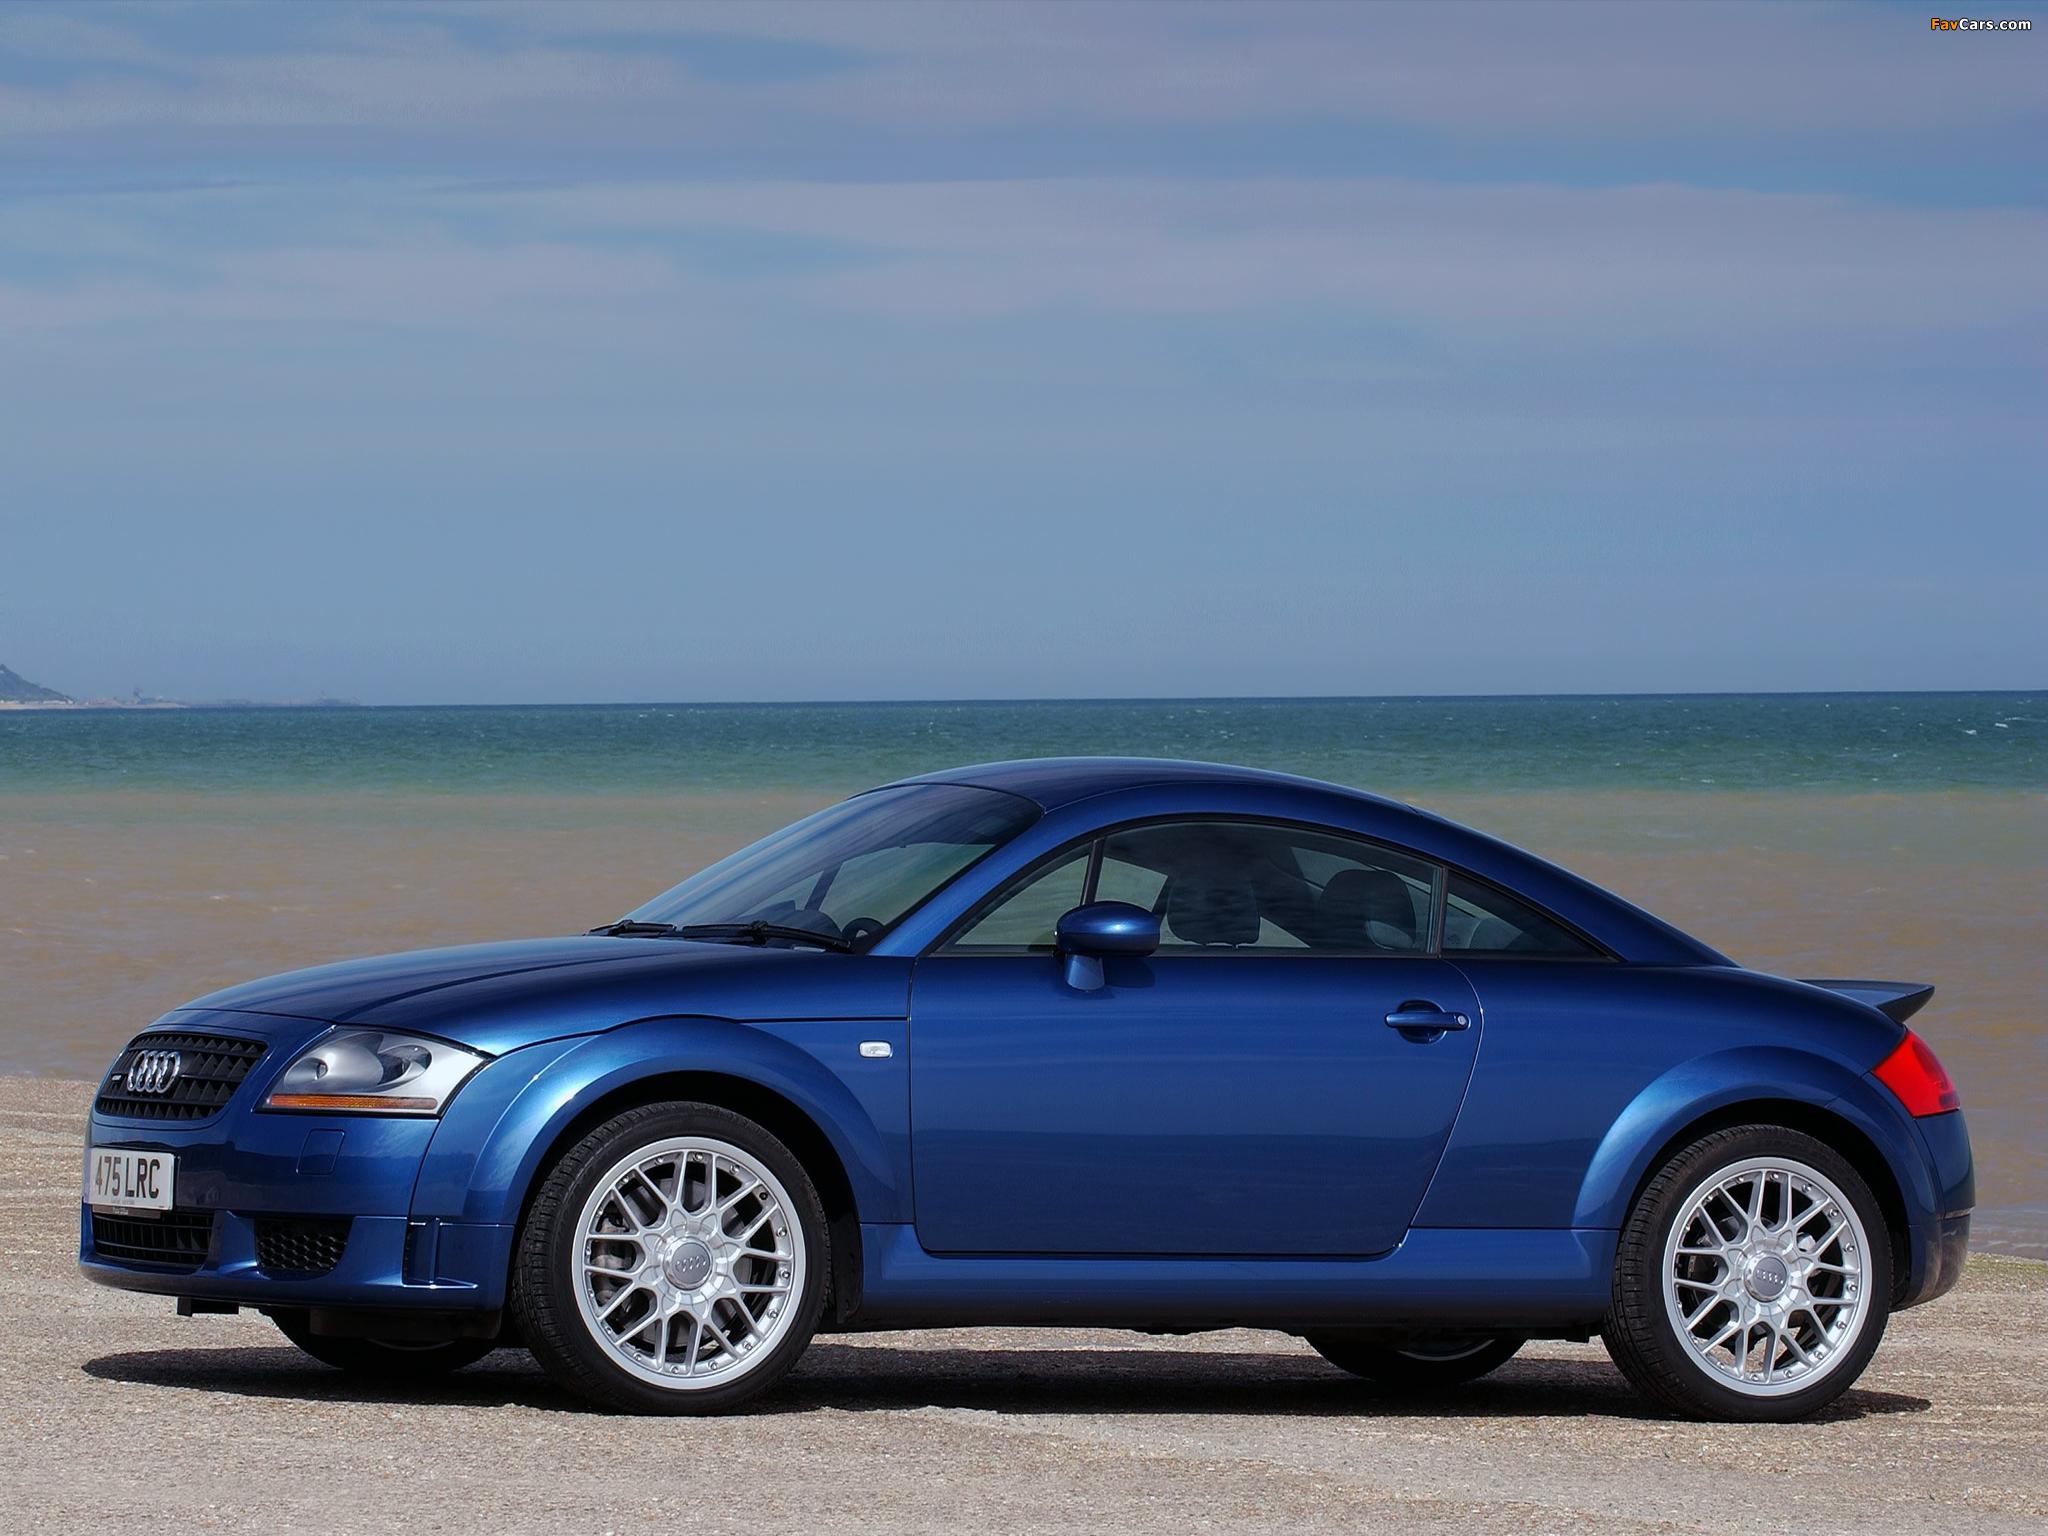 Audi TT Coupé  Audi UK